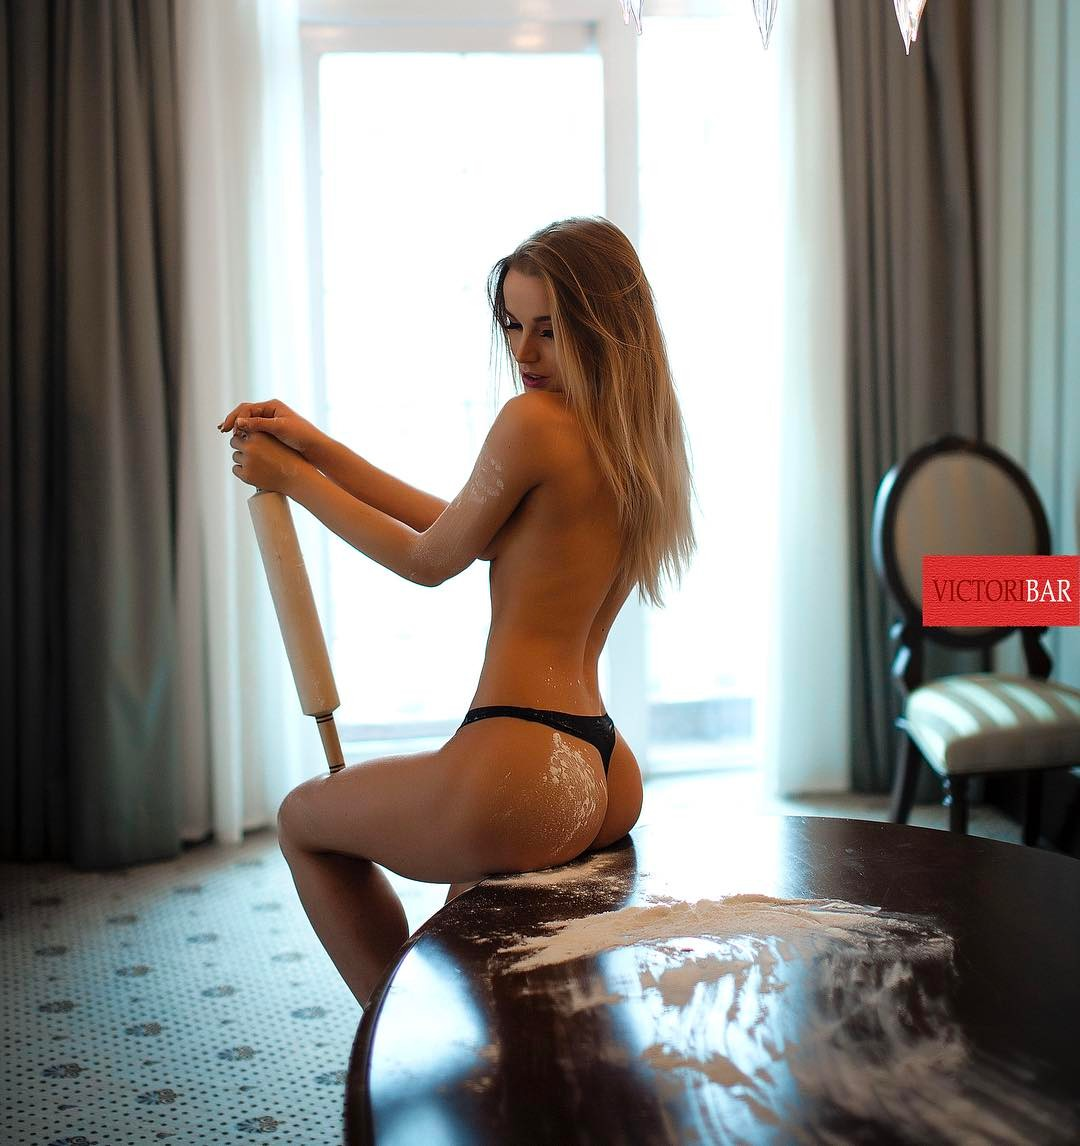 darya-aleksandrova-seksi-chastnoe-lichnoe-otkrovennoe-domashnee-video-molodih-devushek